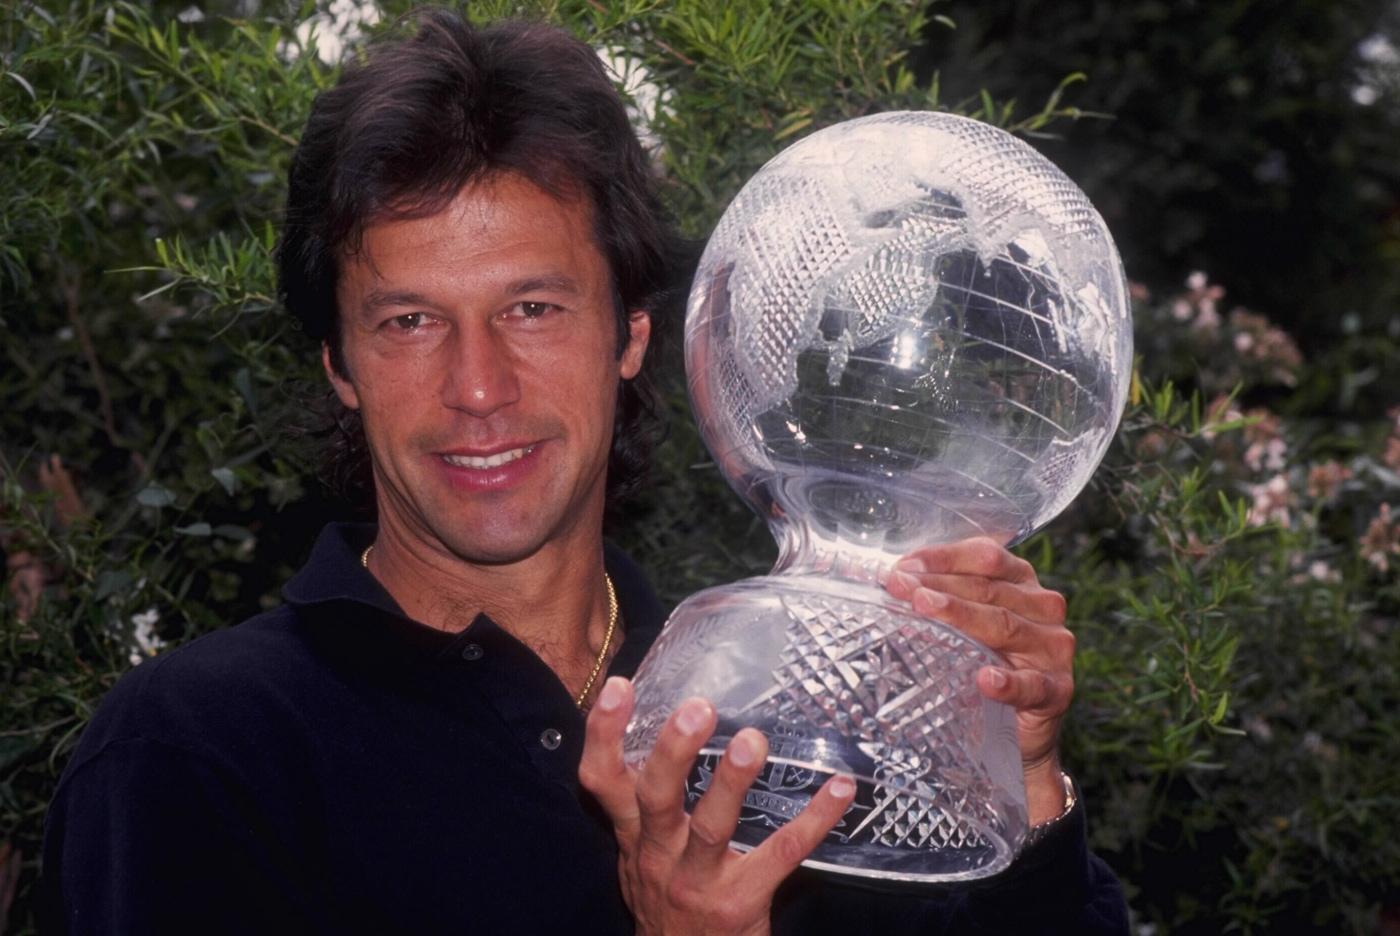 Benson Hedges World Cup 1991 92